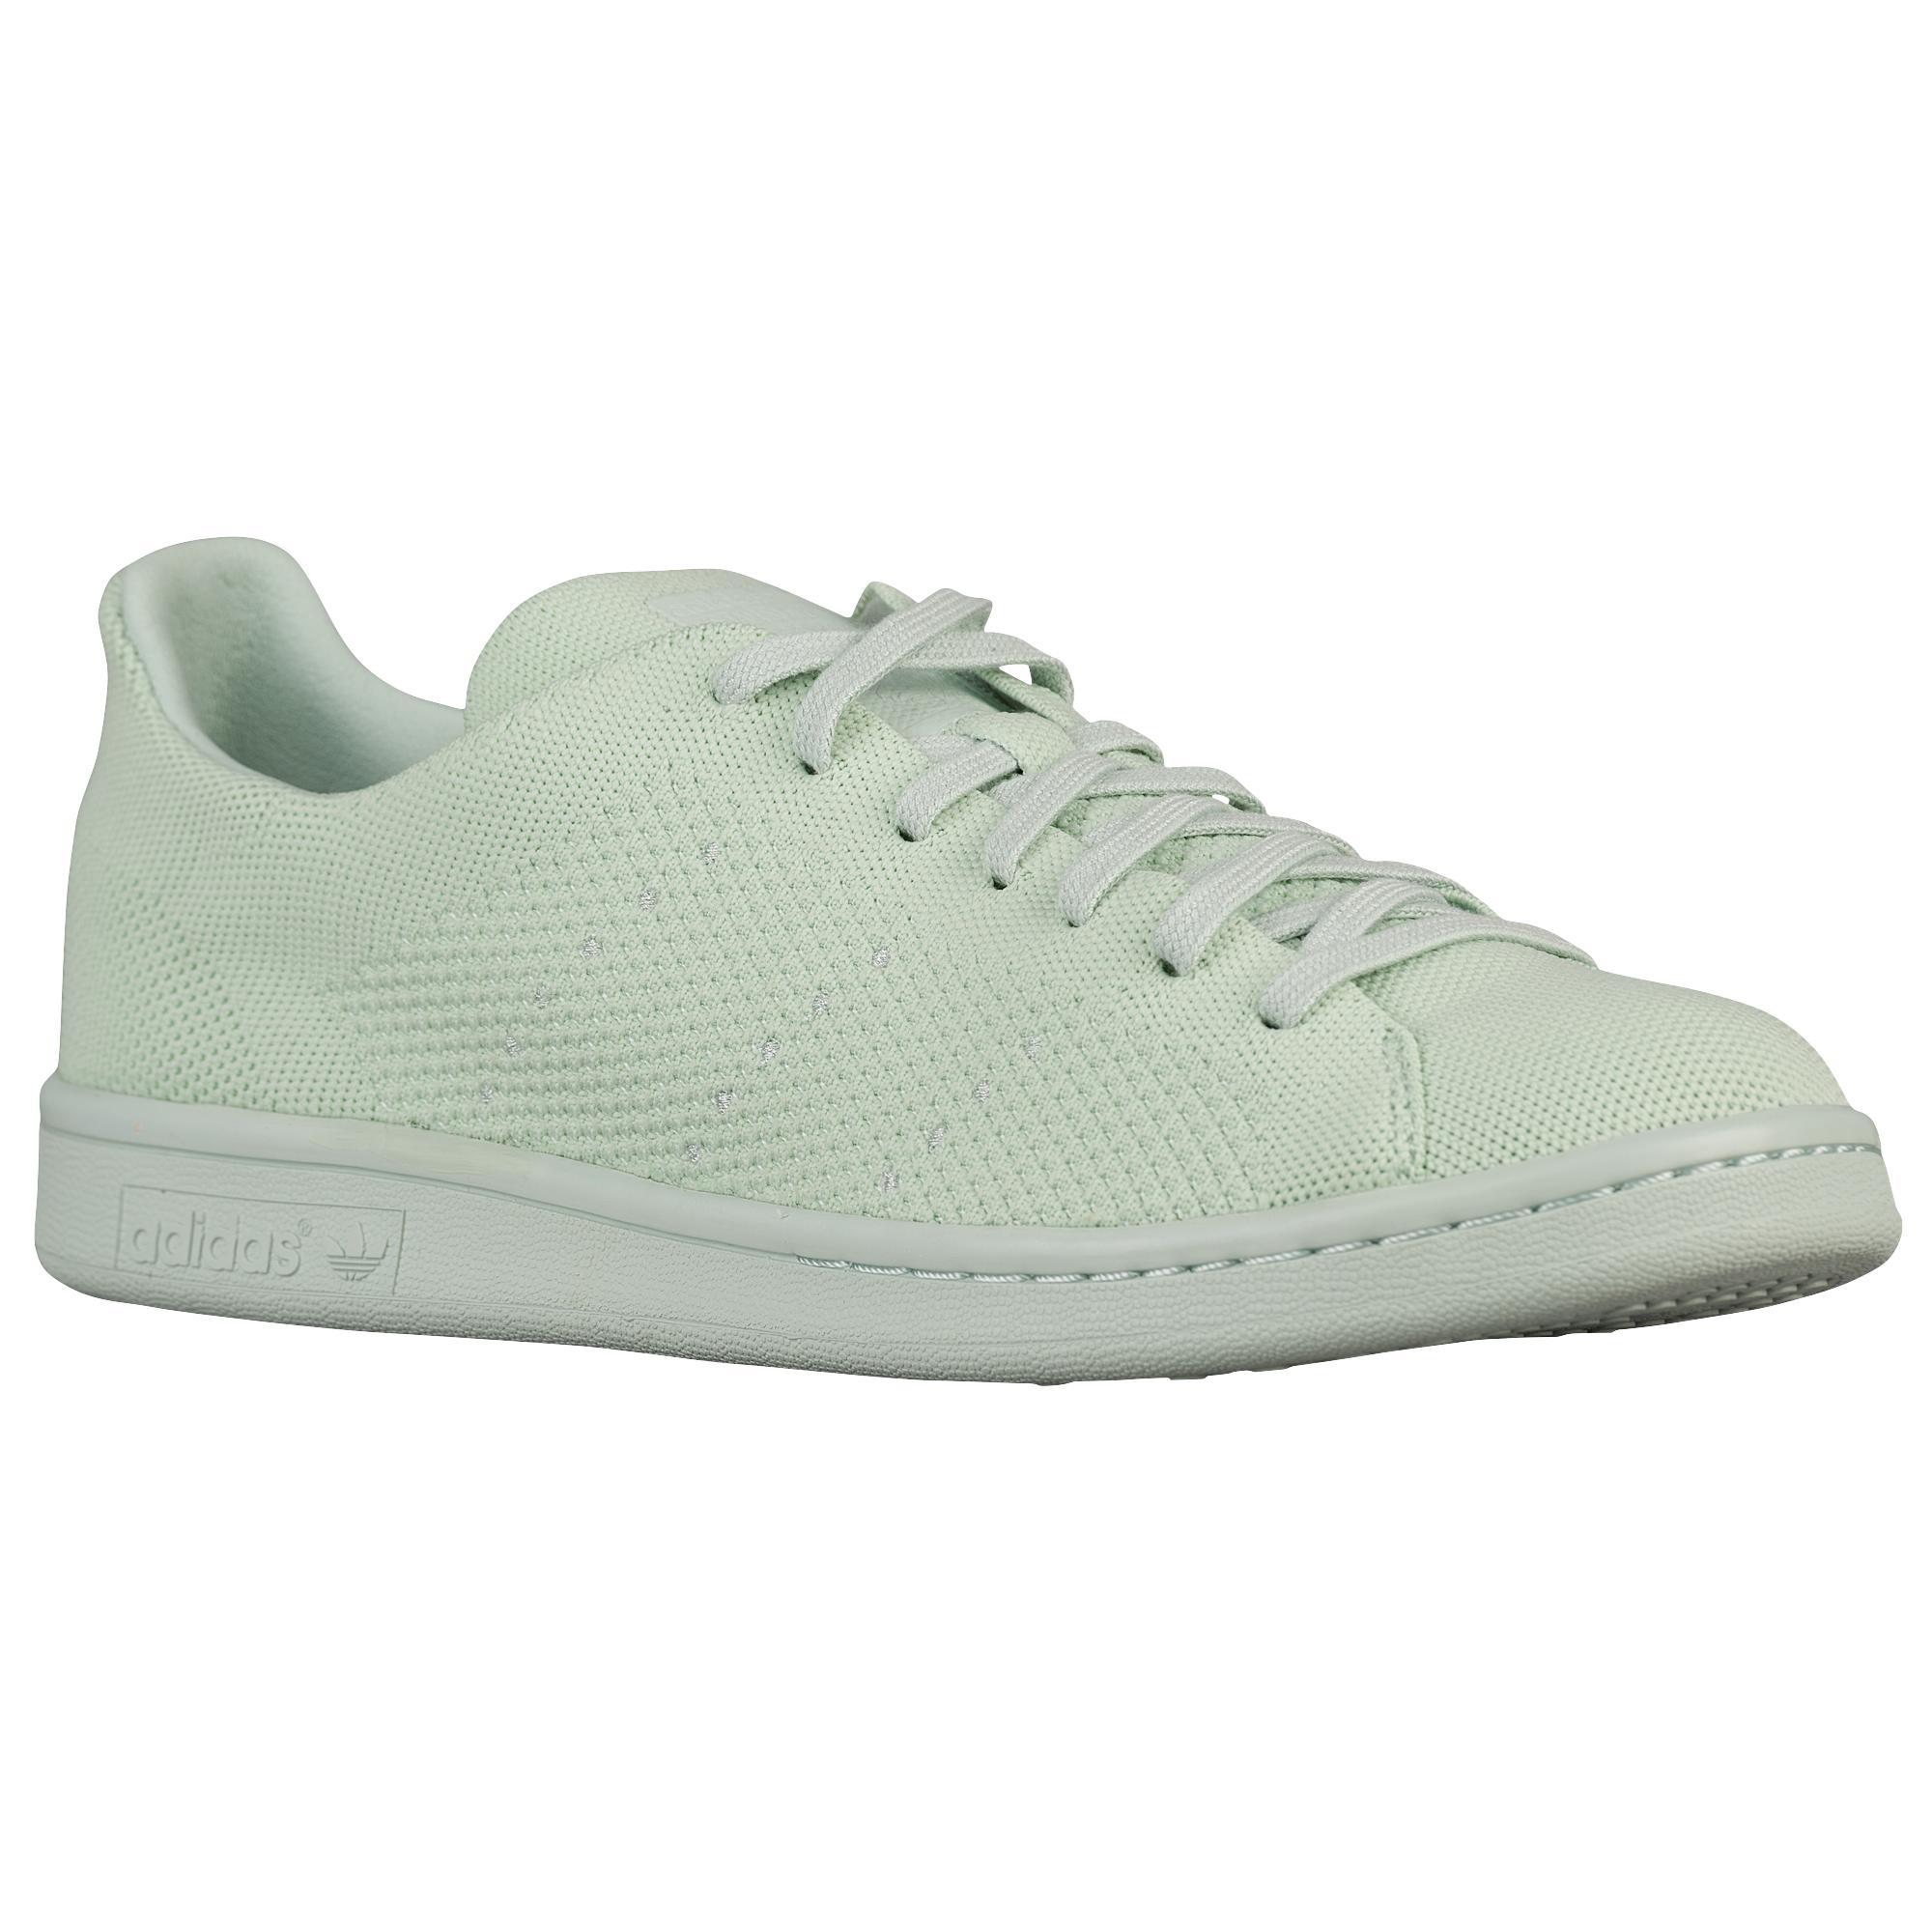 check out 719c2 2de35 adidas Originals Stan Smith Primeknit in Green for Men - Lyst